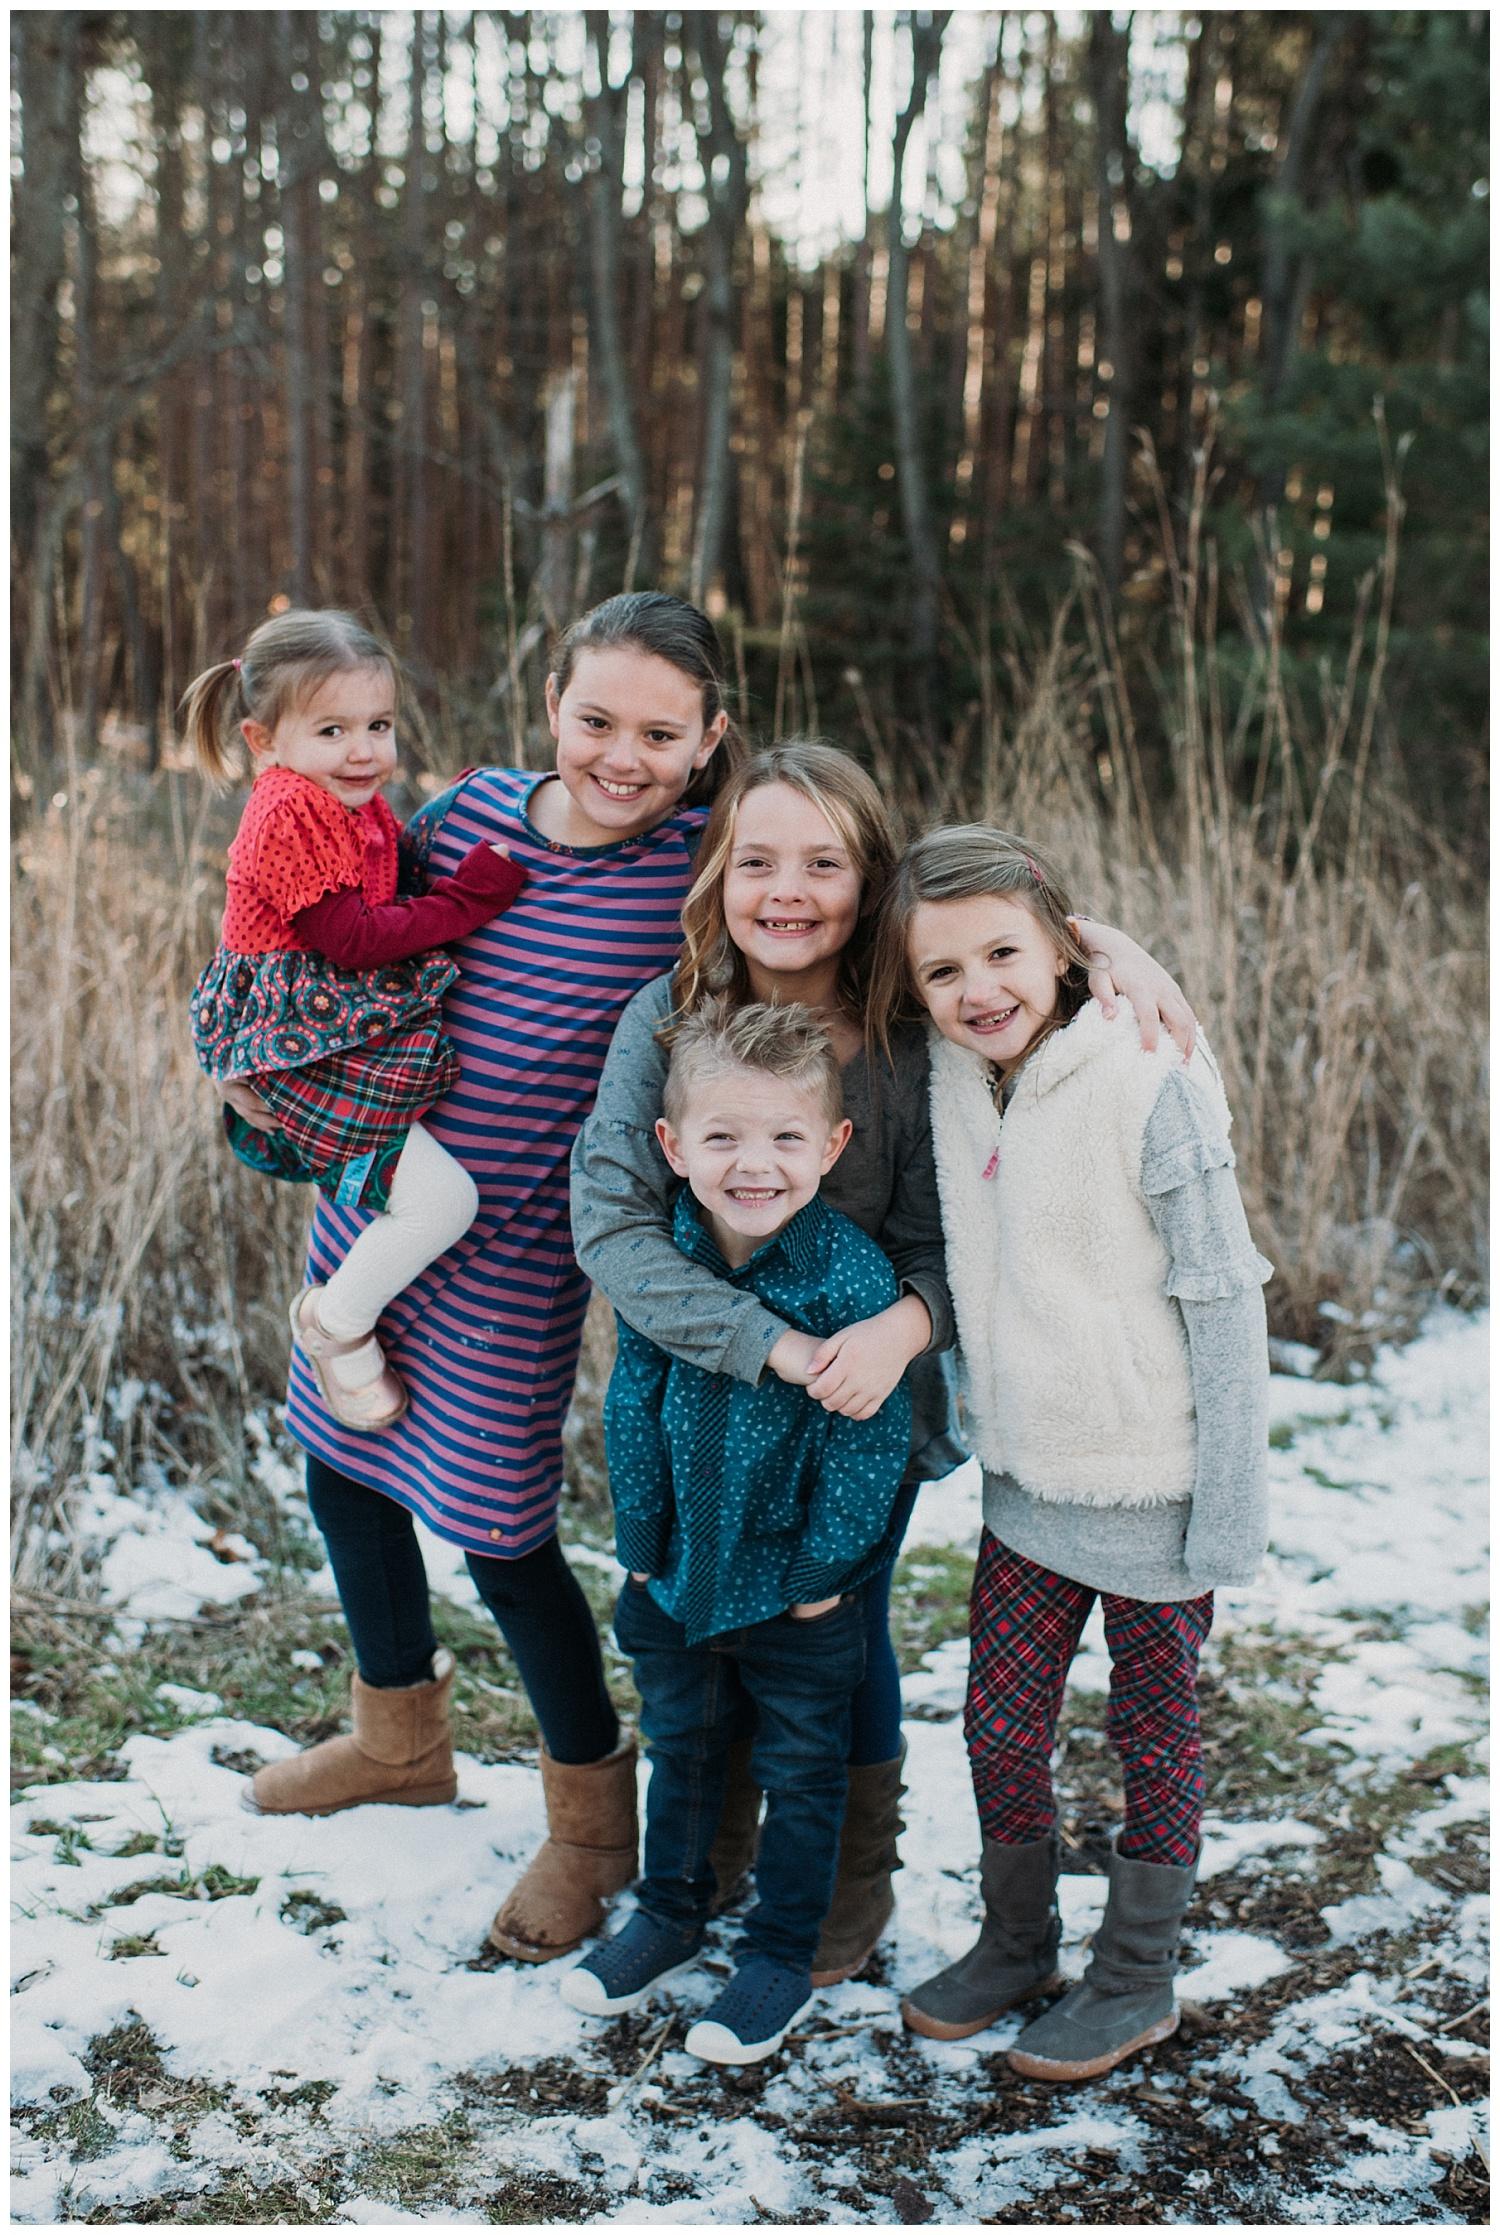 Pewaukee-family-photographer-2019 (18).jpg